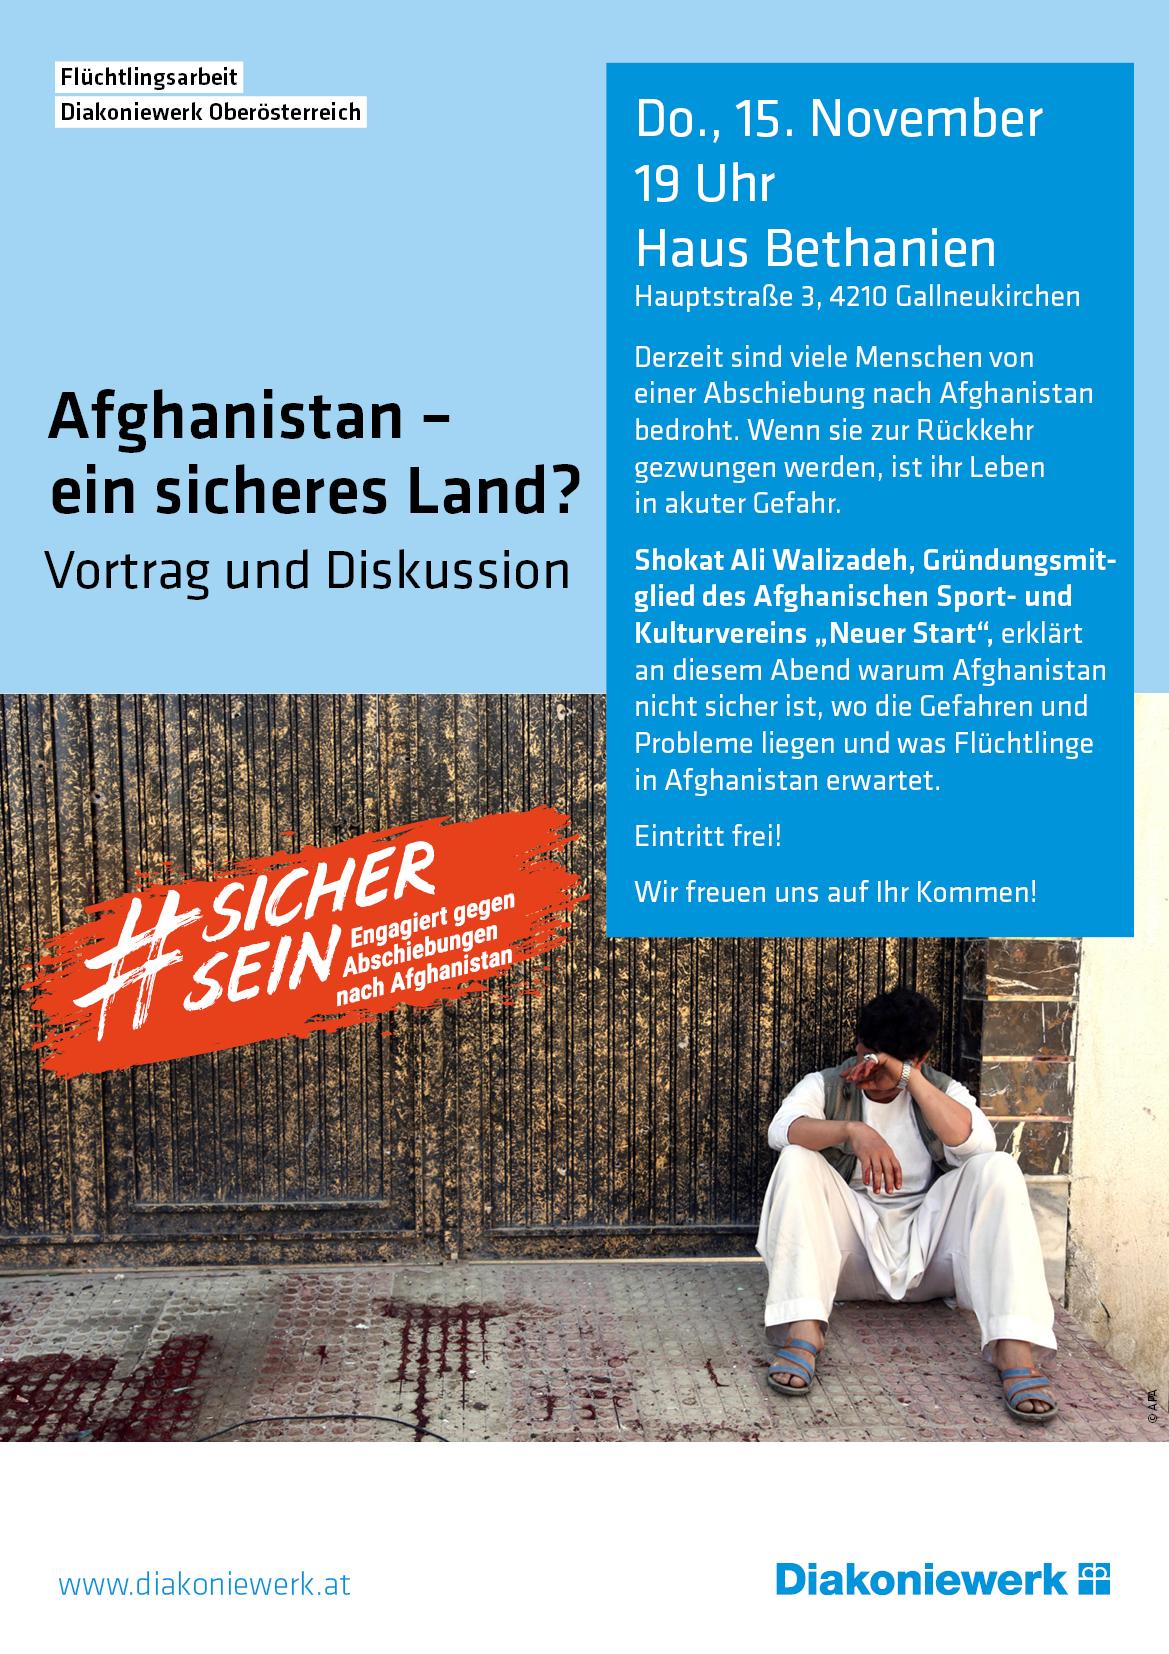 Flüchtlingsarbeit_Vortrag-Afghanistan.jpg